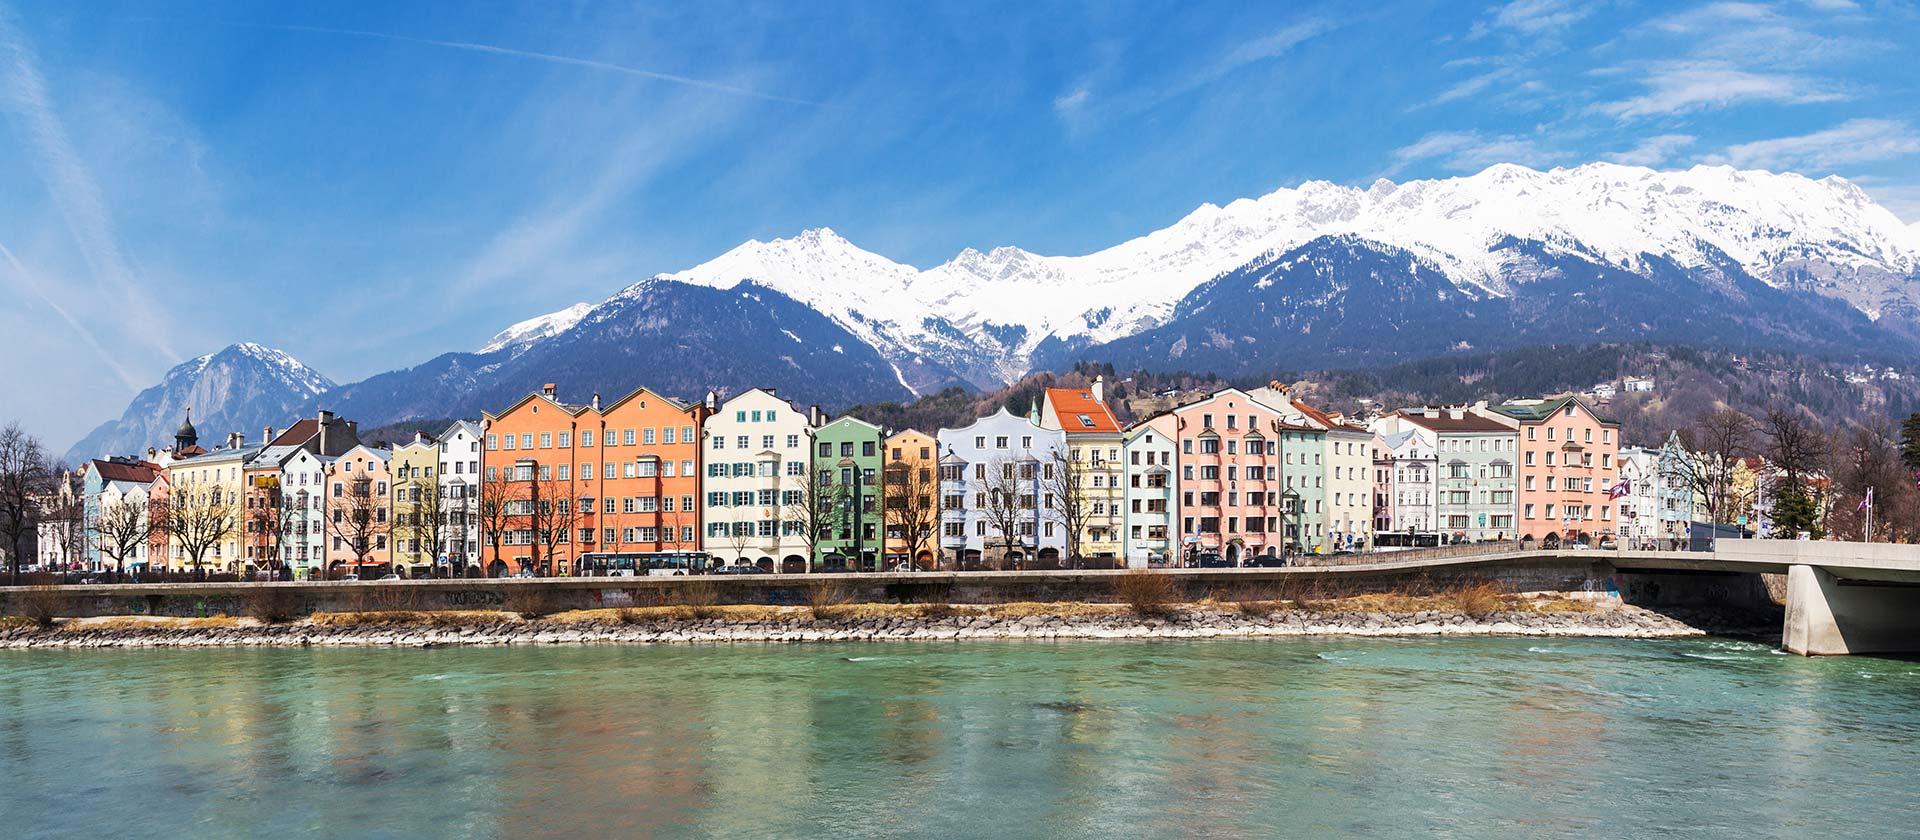 AMSOS 2019 – Innsbruck